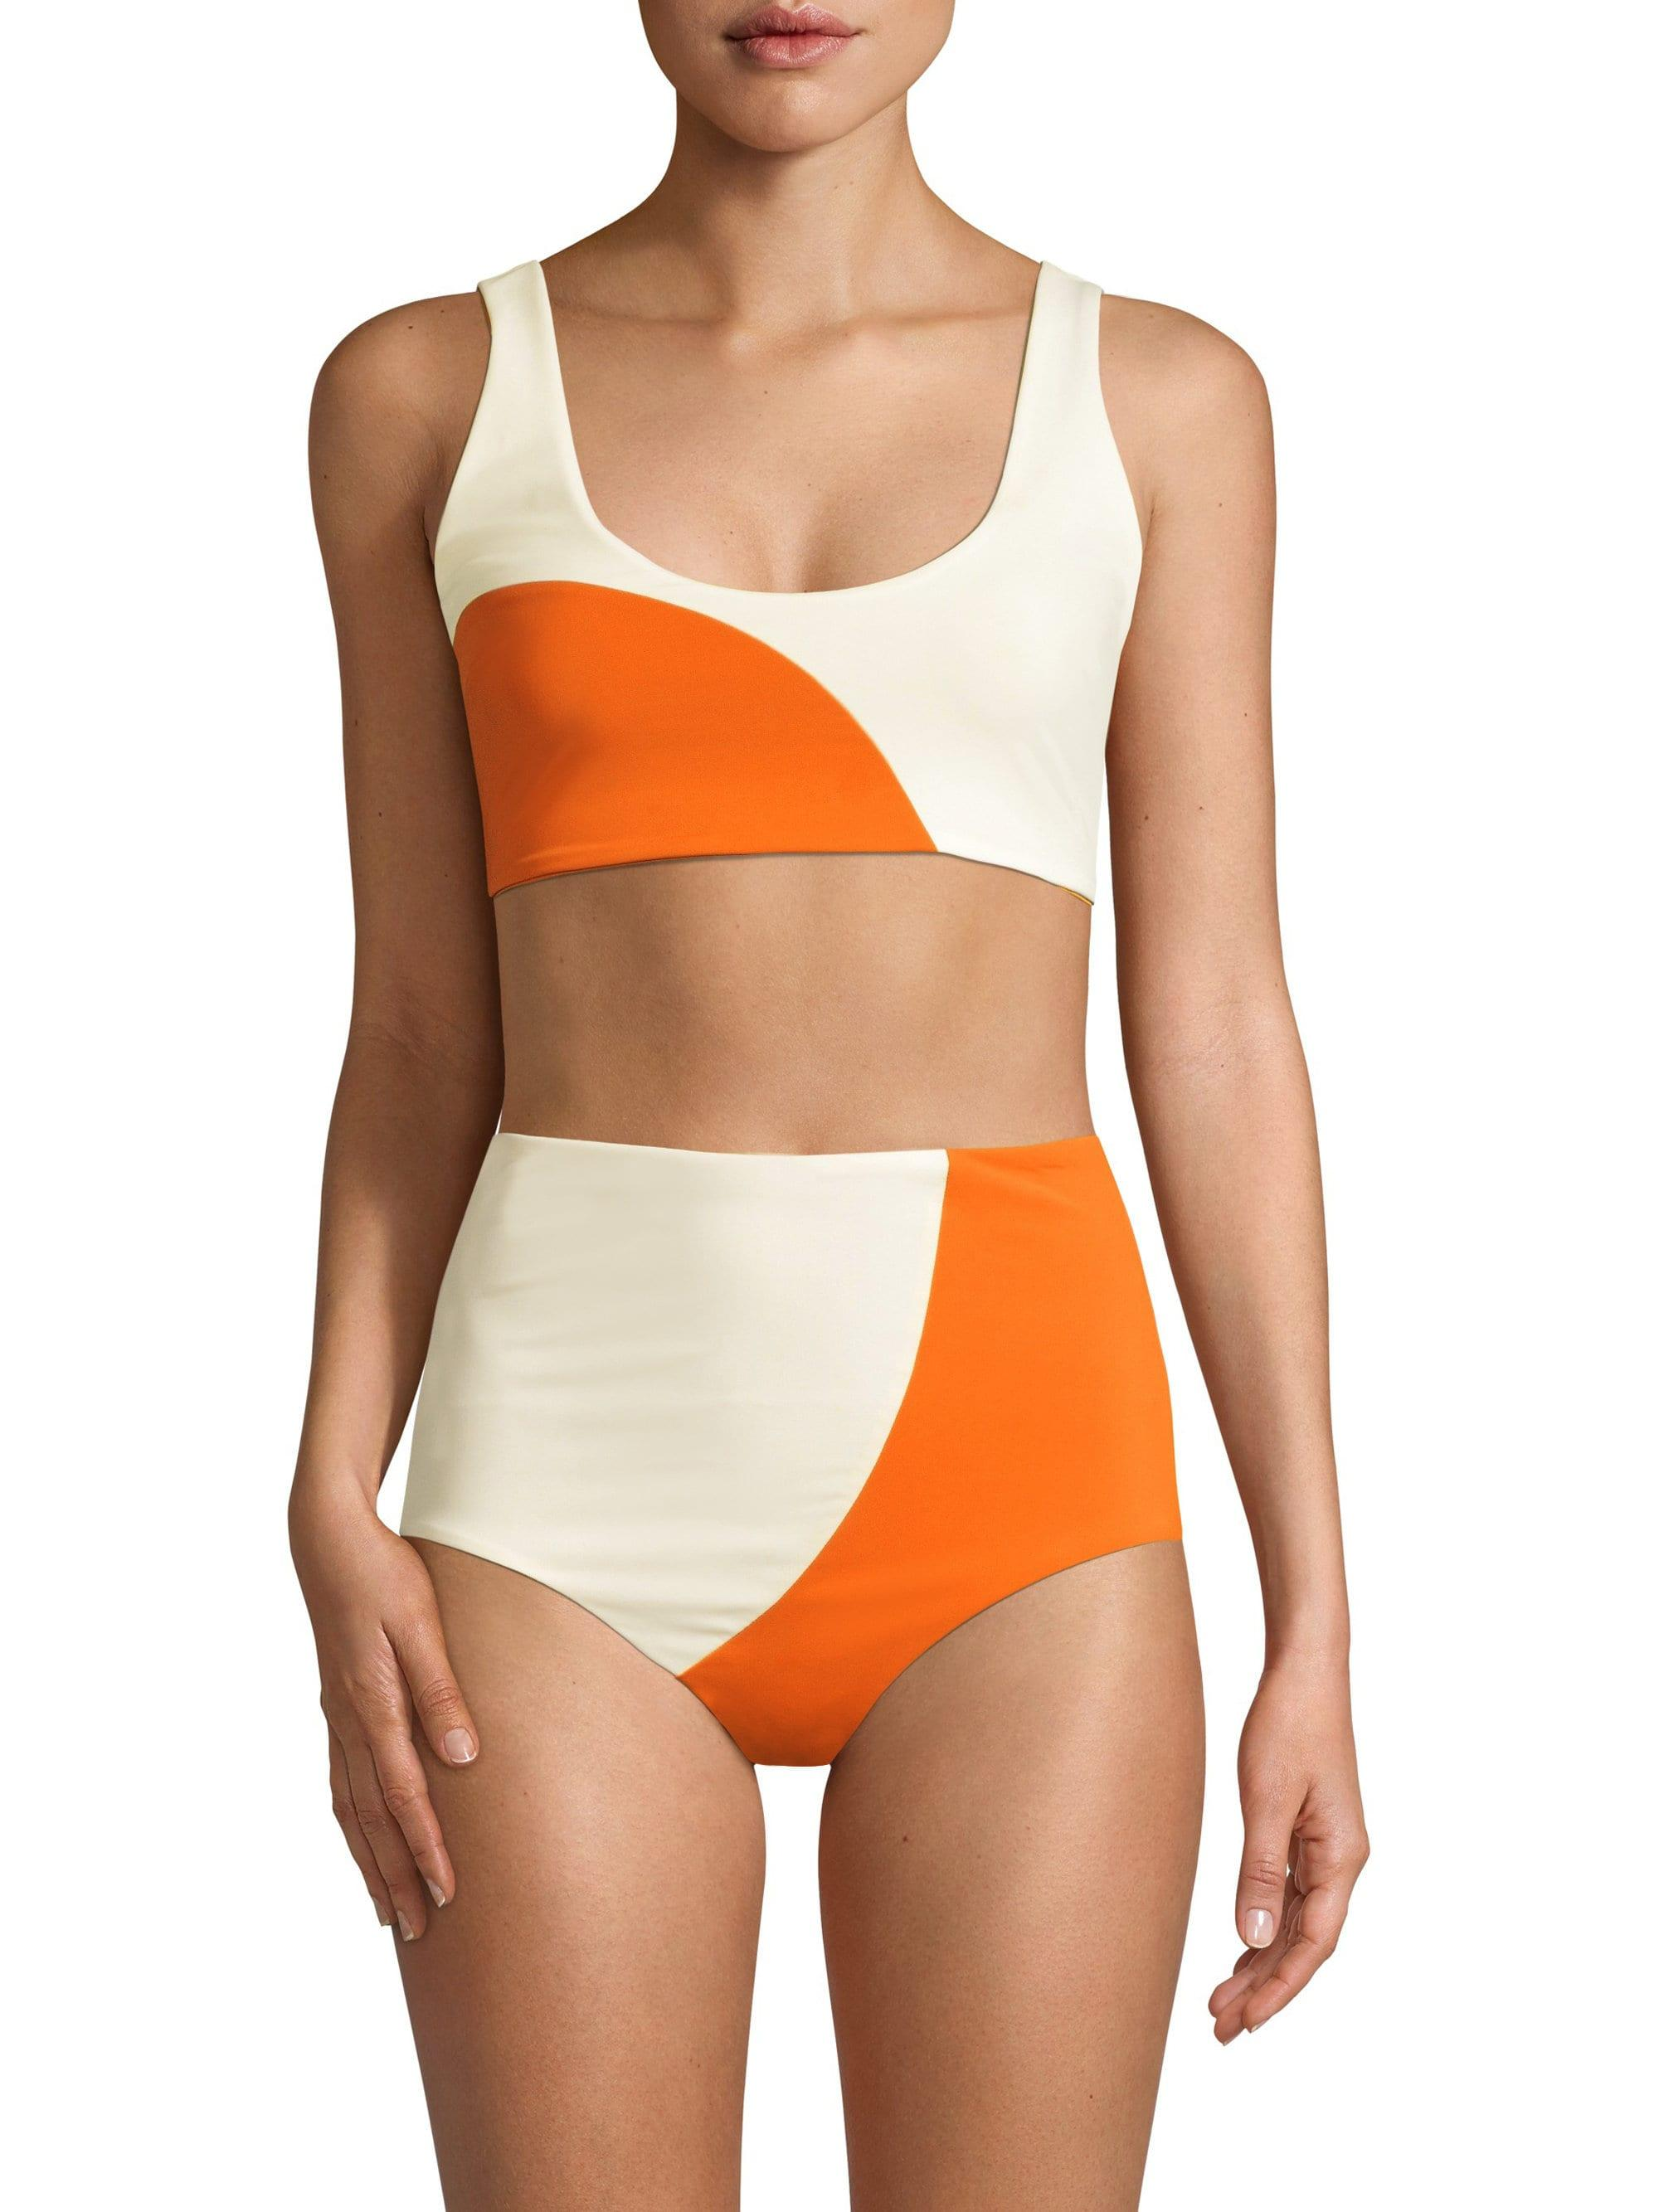 6e4948a4605e Lyst - Mara Hoffman Lira Bikini Top In Orange   Cream in Orange ...